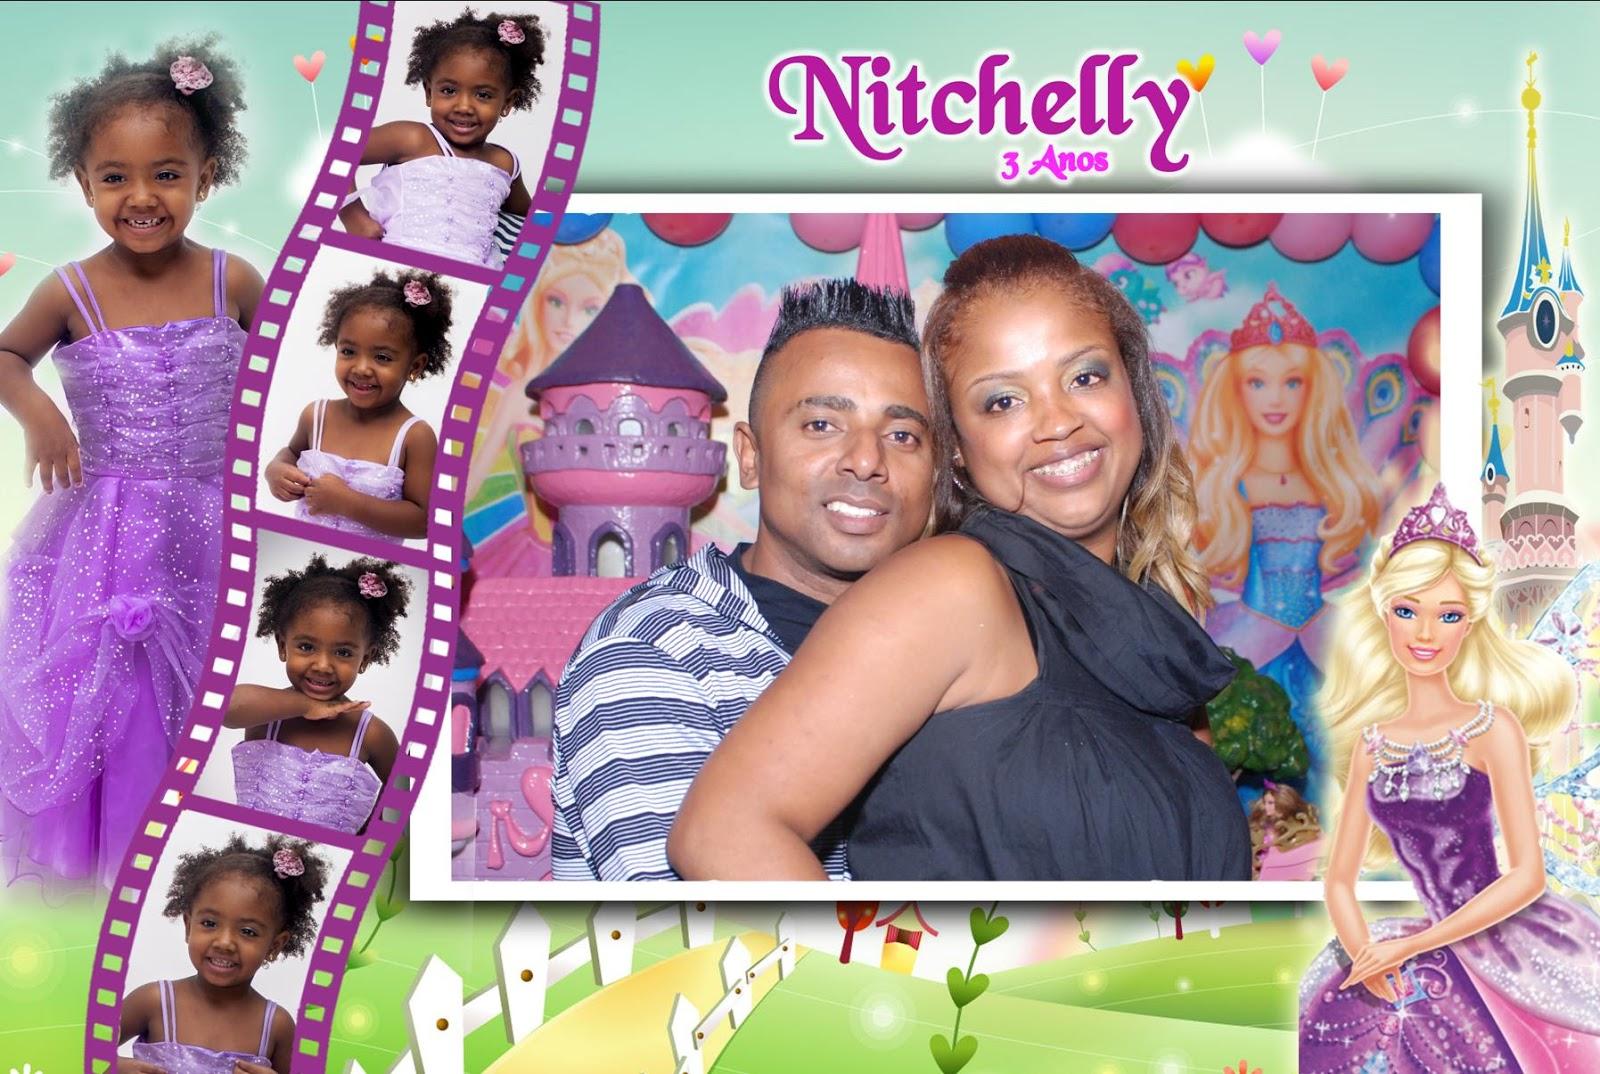 http://fotos-lembranca.blogspot.com.br/2014/05/20140523-nitchelly-3-anos-barbie.html